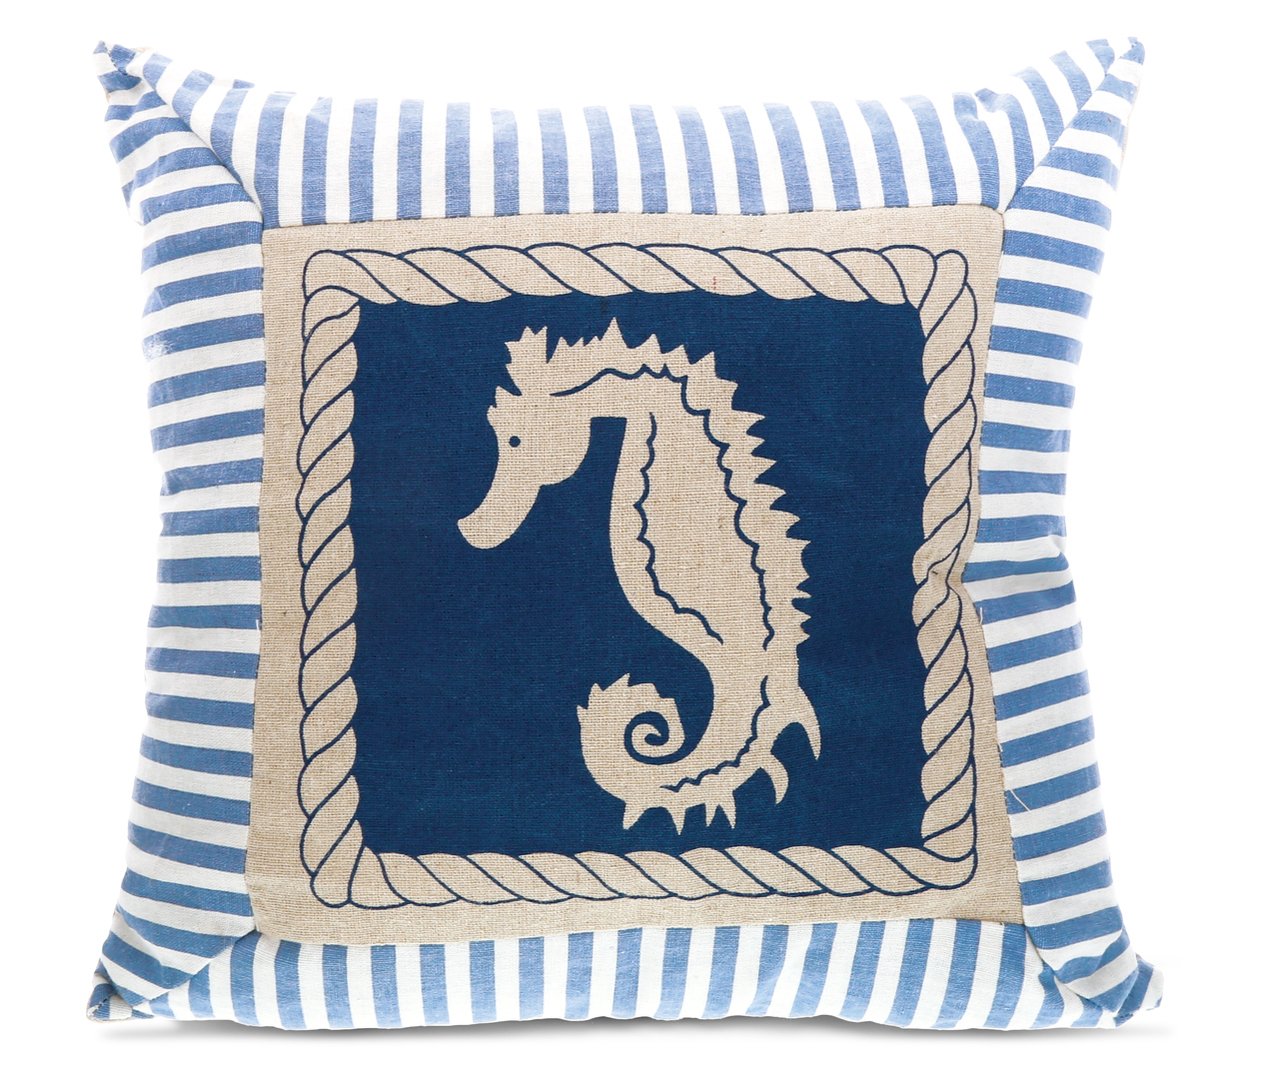 Nautical Decor CoTa Global Aqua Sea Horse Throw Pillow by CoTa